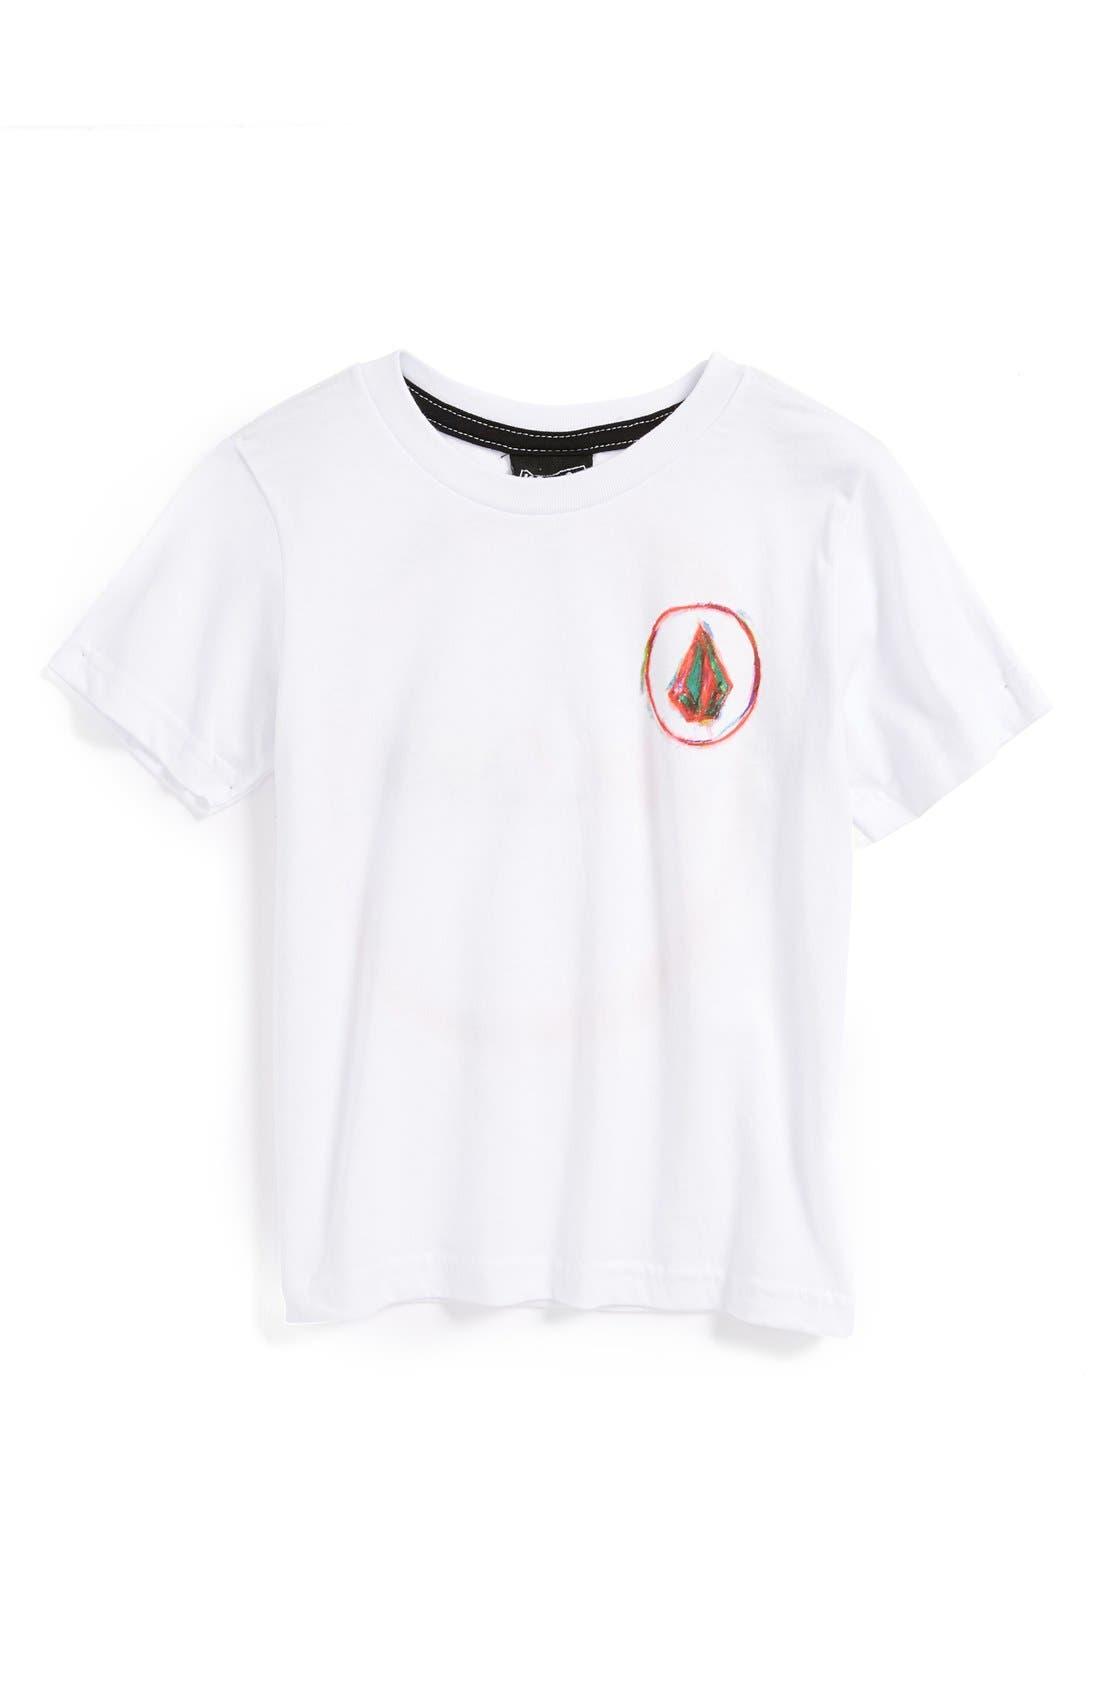 Alternate Image 1 Selected - Volcom 'Ojas' T-Shirt (Toddler Boys)